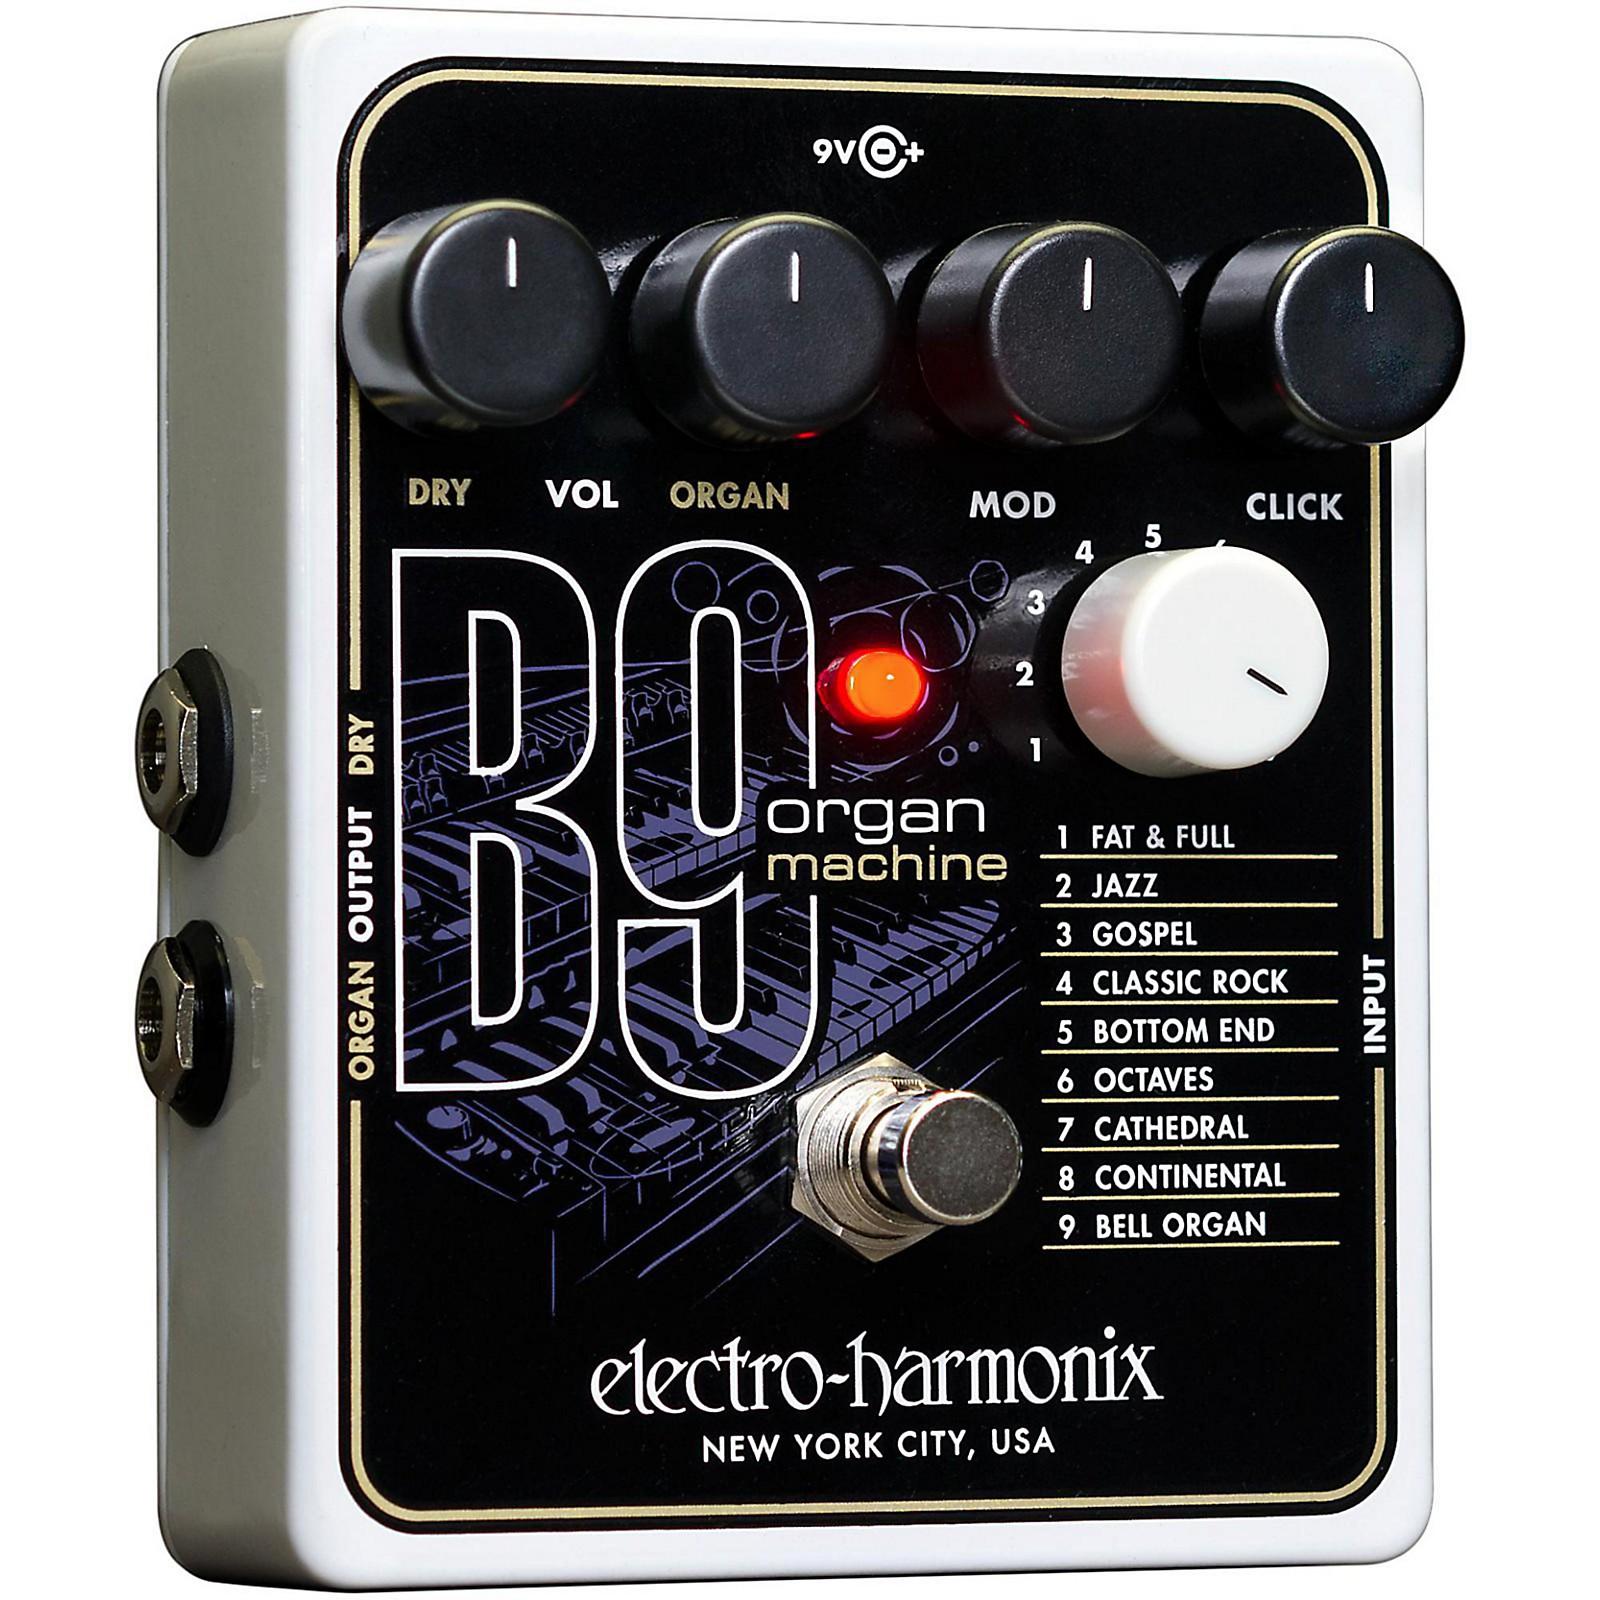 Electro-Harmonix B9 Organ Machine Guitar Effects Pedal